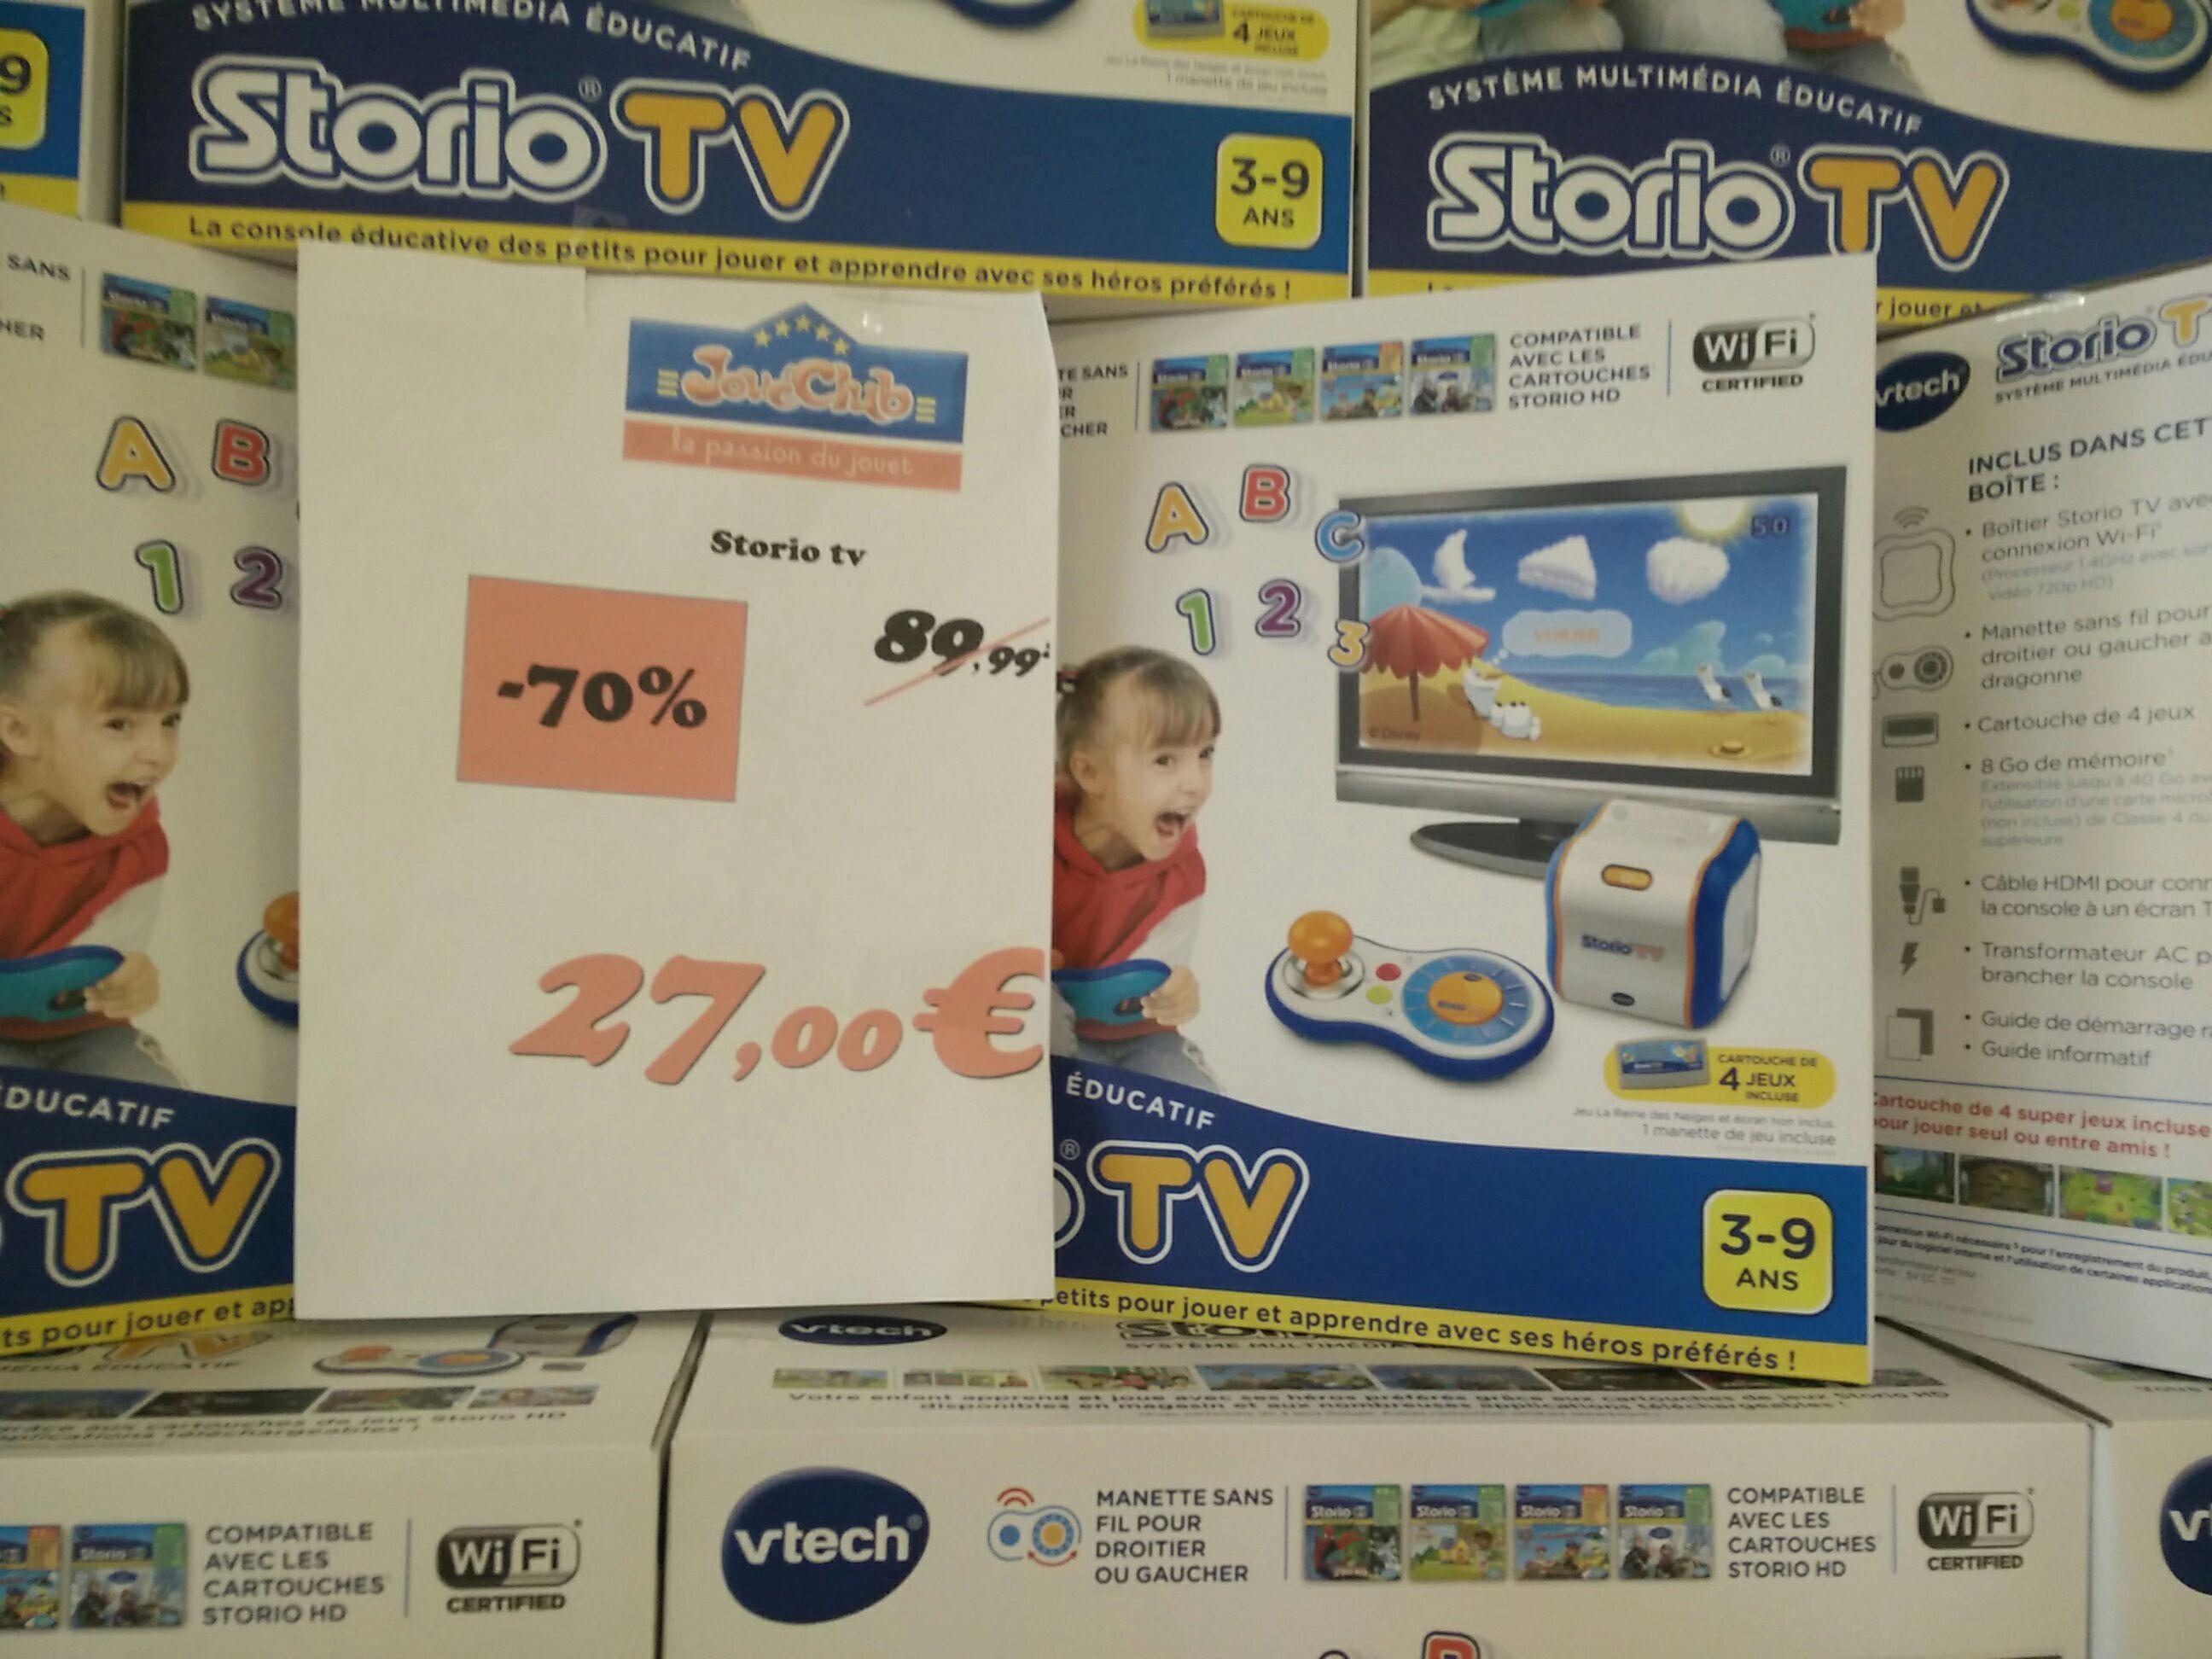 Console éducative Vtech Storio TV